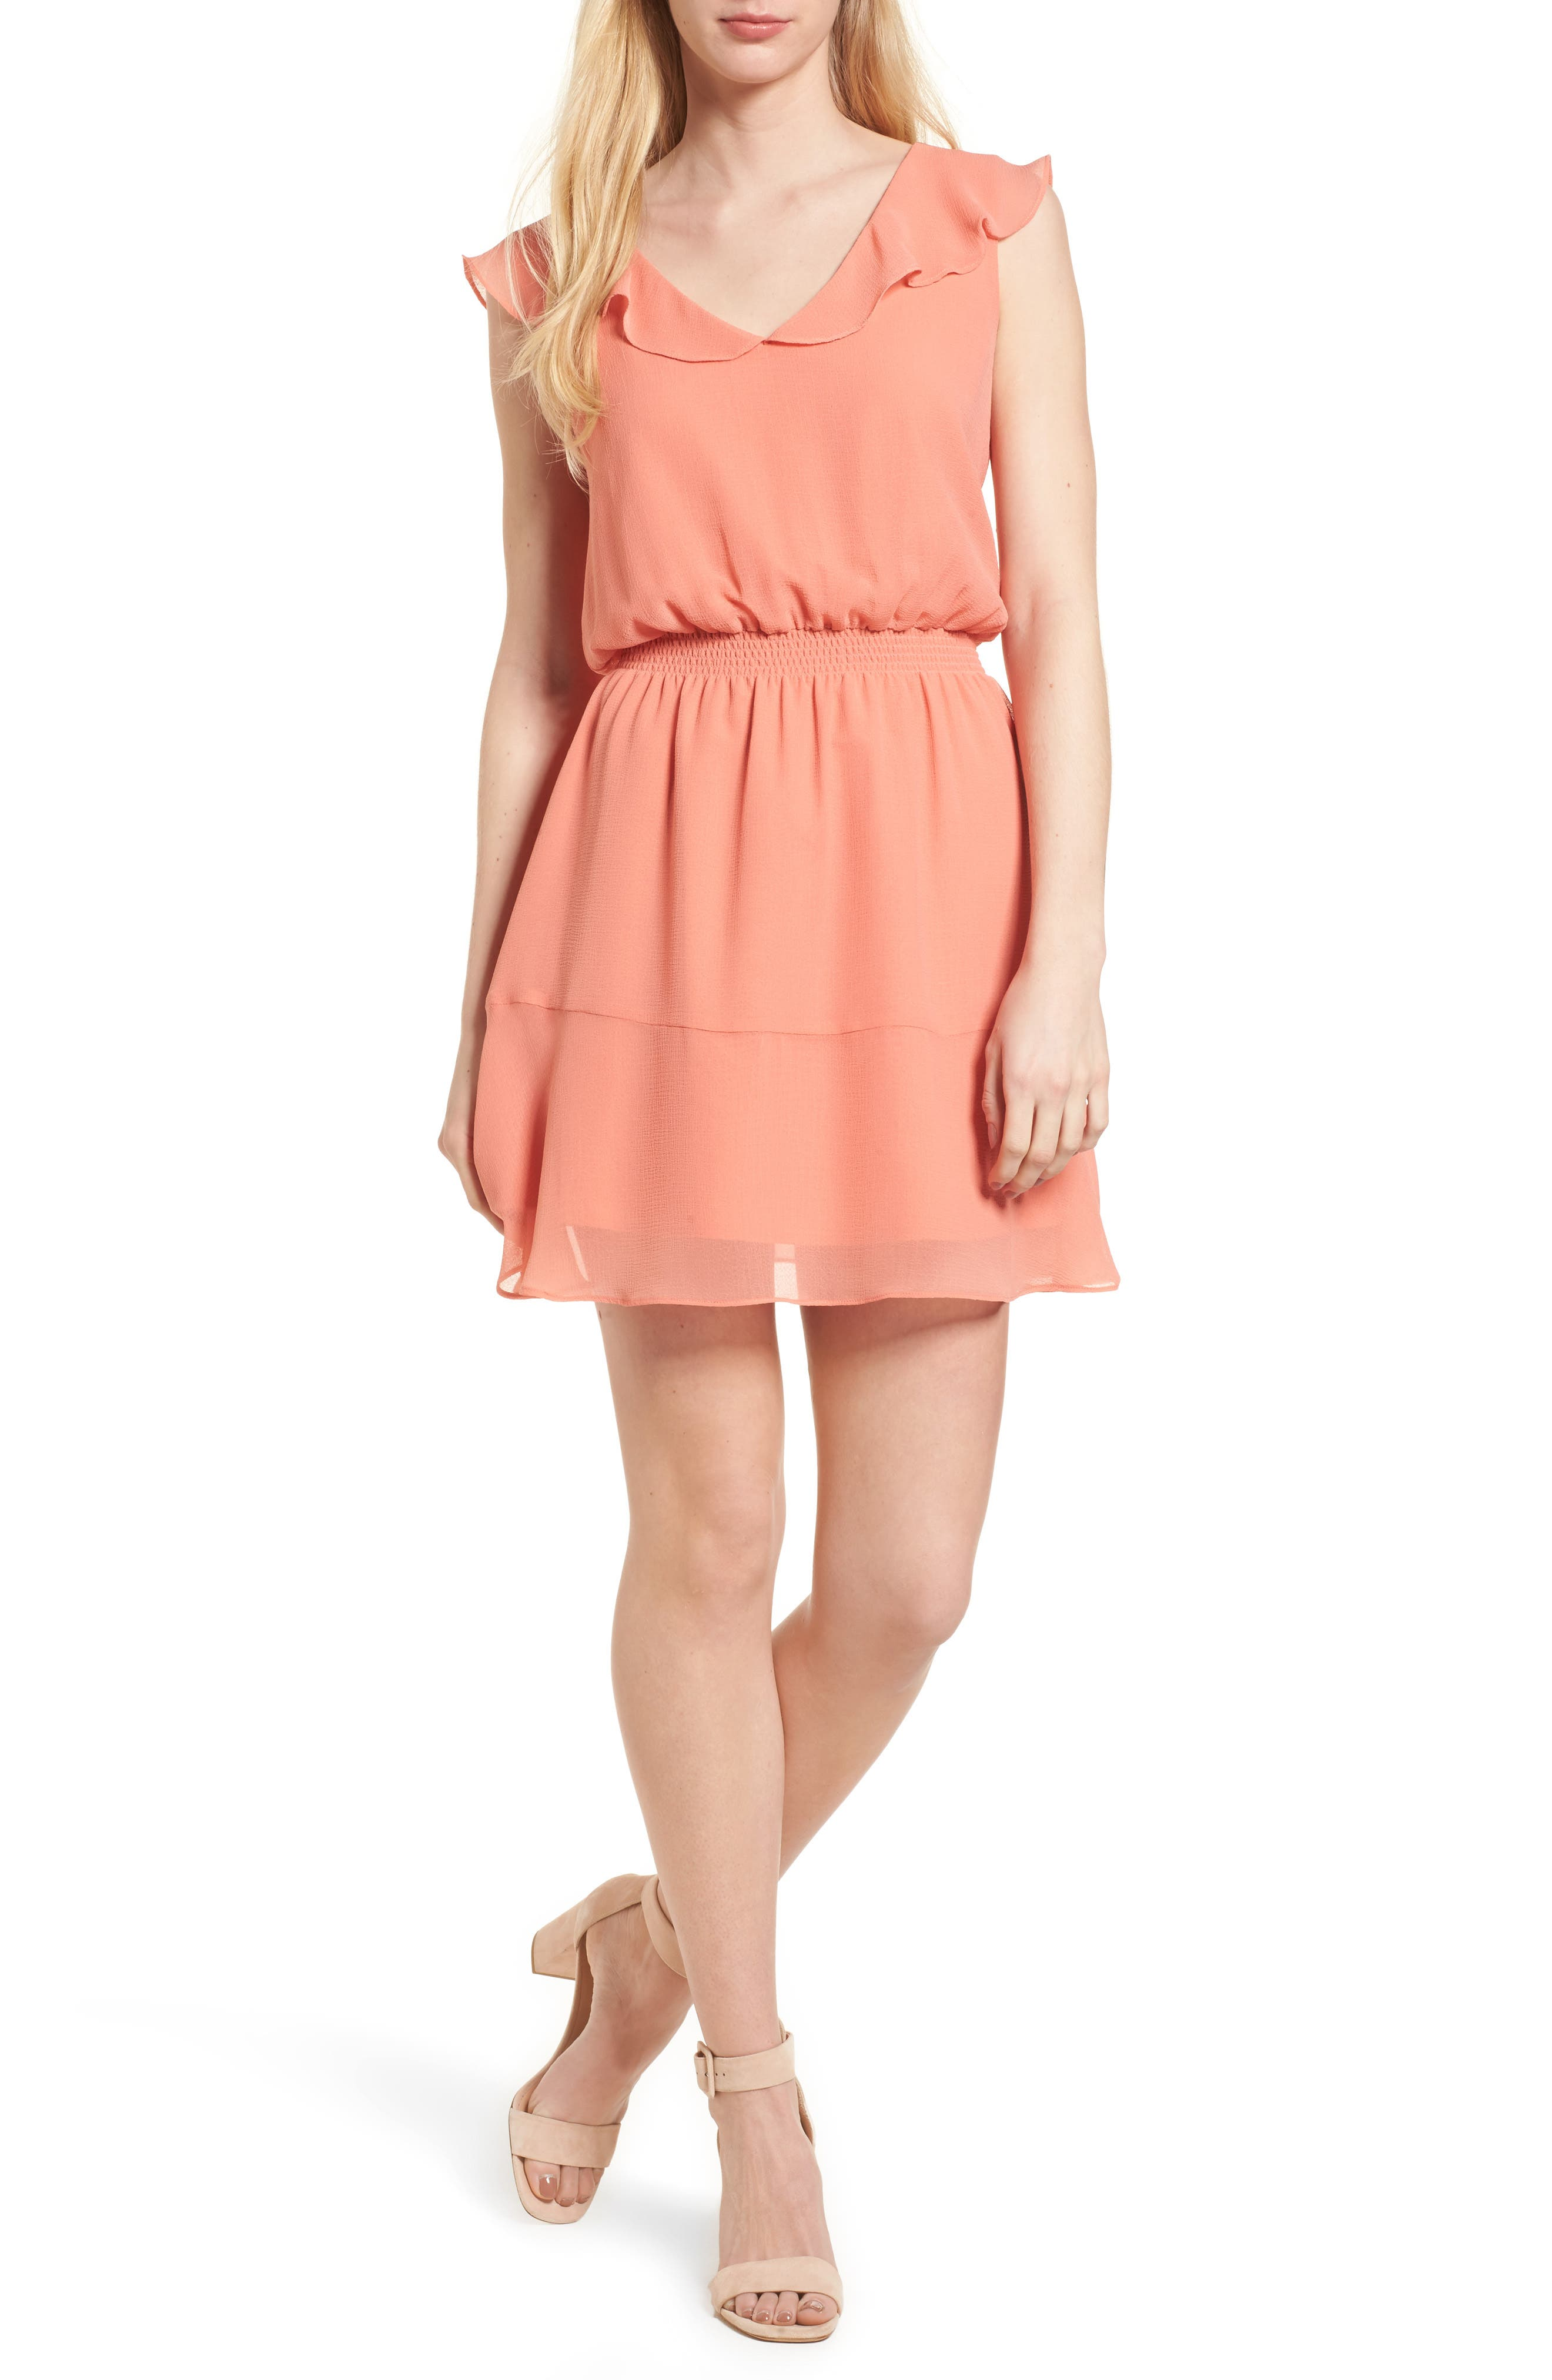 Main Image - cupcakes and cashmere Iniko Blouson Dress